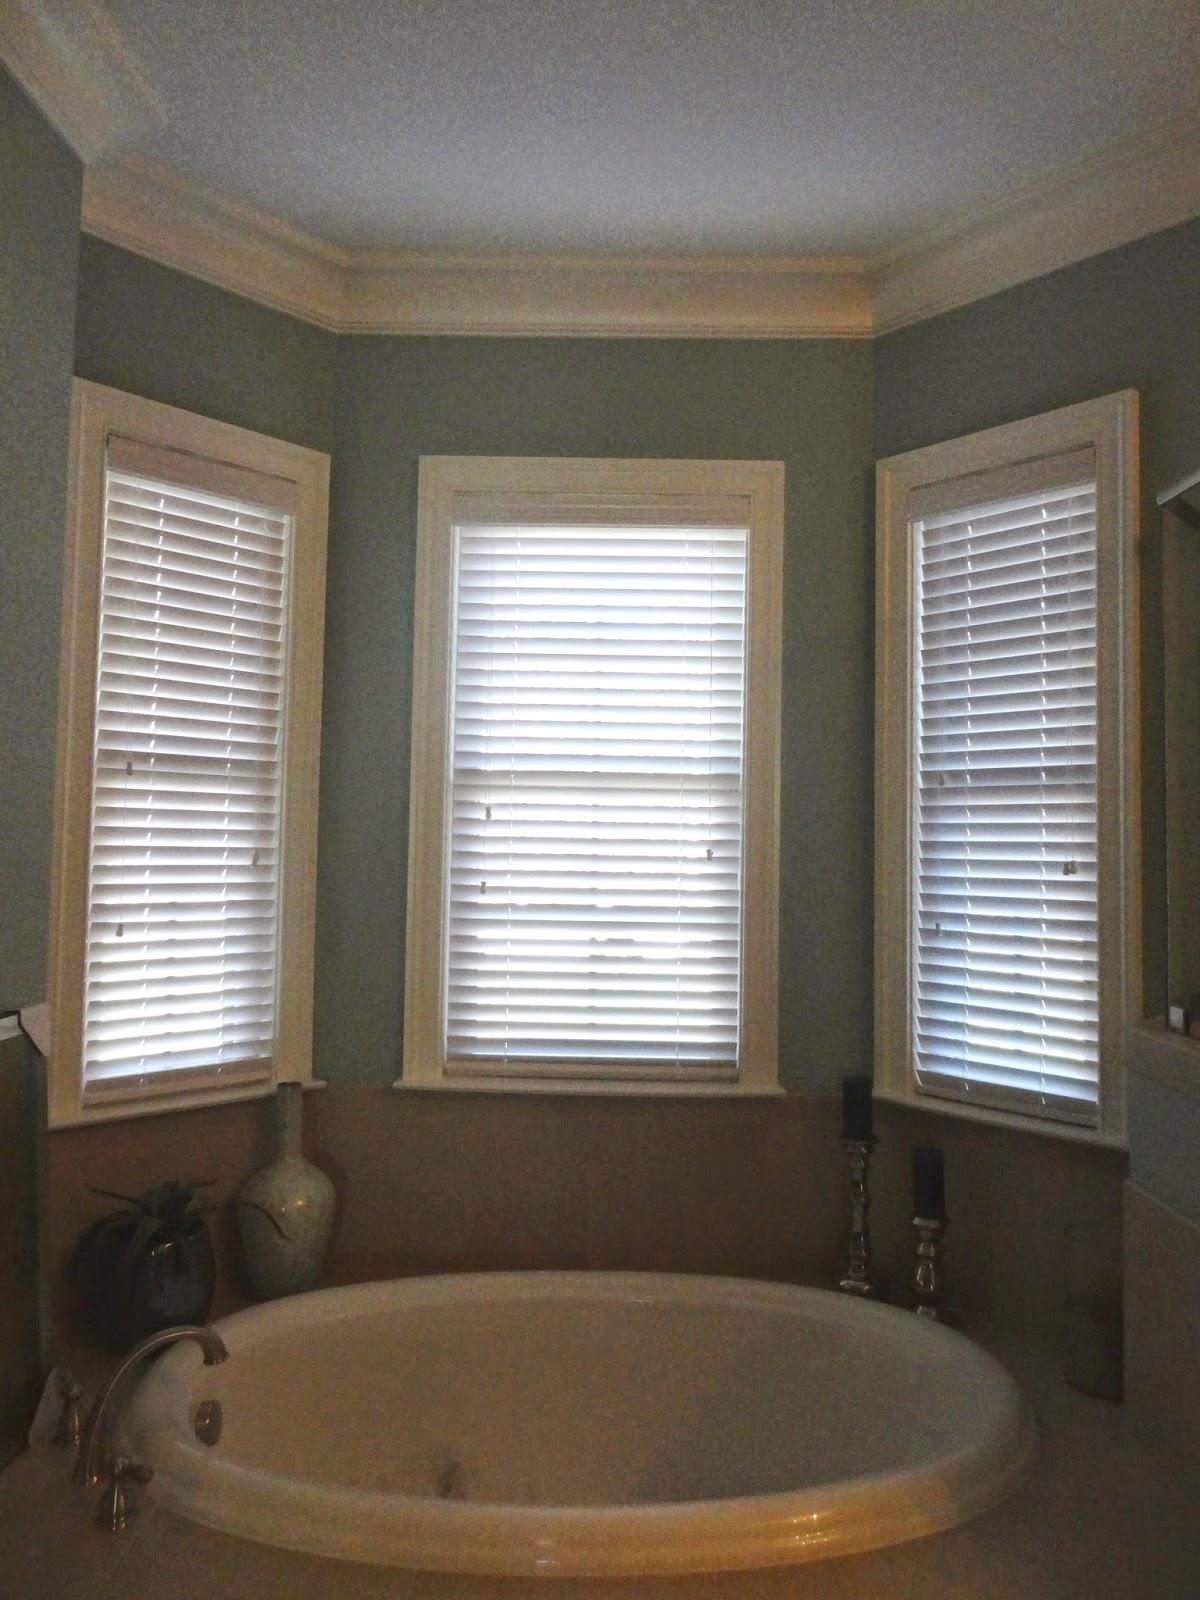 Bathroom Remodel High Point Nc greensboro interior design - window treatments greensboro - custom